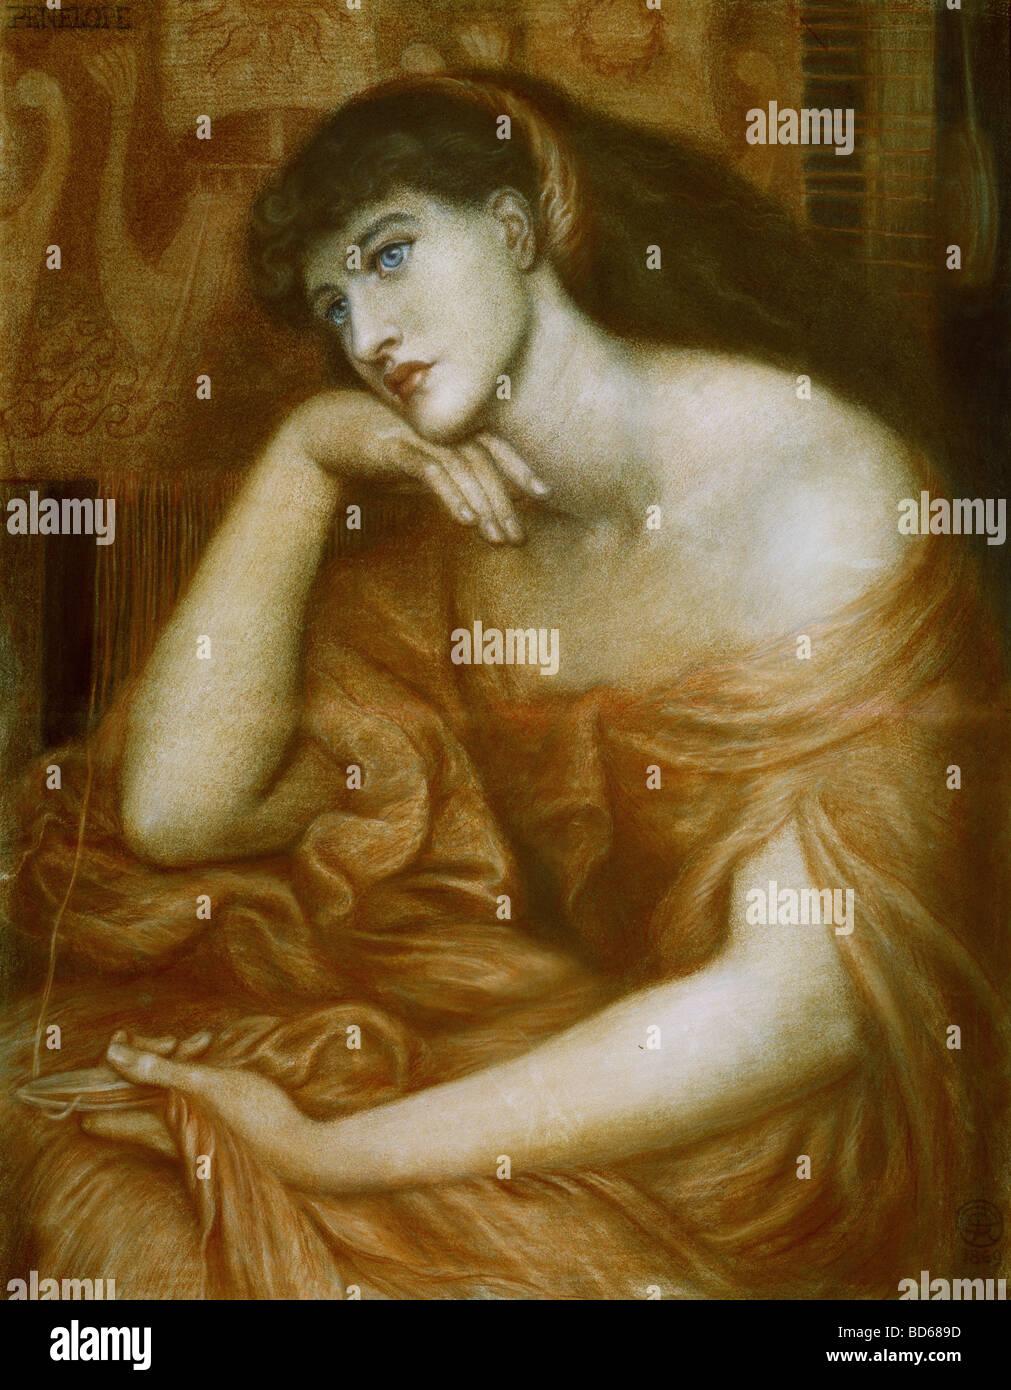 "Bellas artes, Dante Gabriel Rossetti (1828 - 1882), pintura, ""Penélope"", óleo sobre lienzo, 1869, el simbolismoFoto de stock"